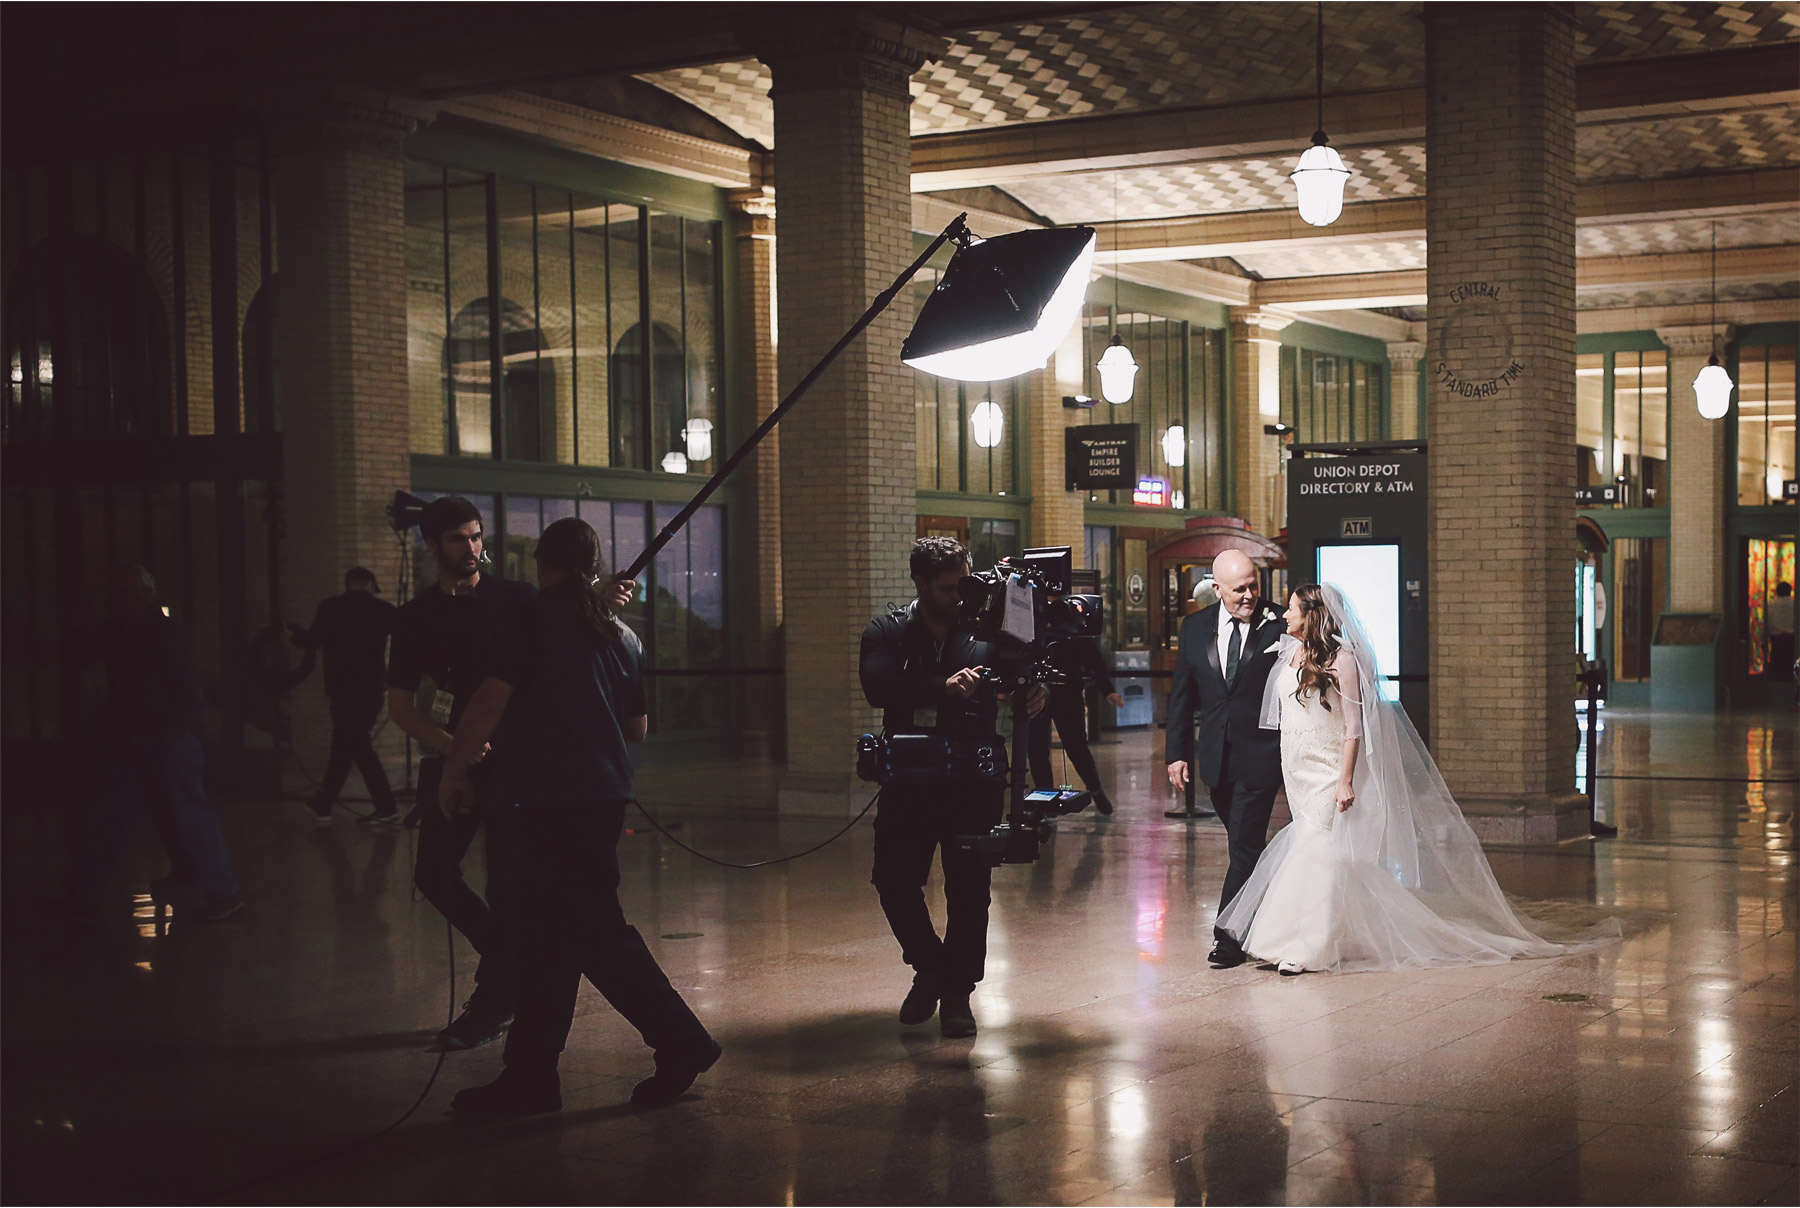 12-Andrew-Vick-Photography-My-Great-Big-Live-Wedding-with-David-Tutera-Behind-the-Scenes-Minnesota-Union-Depot-Saint-Paul-tv-crew.jpg